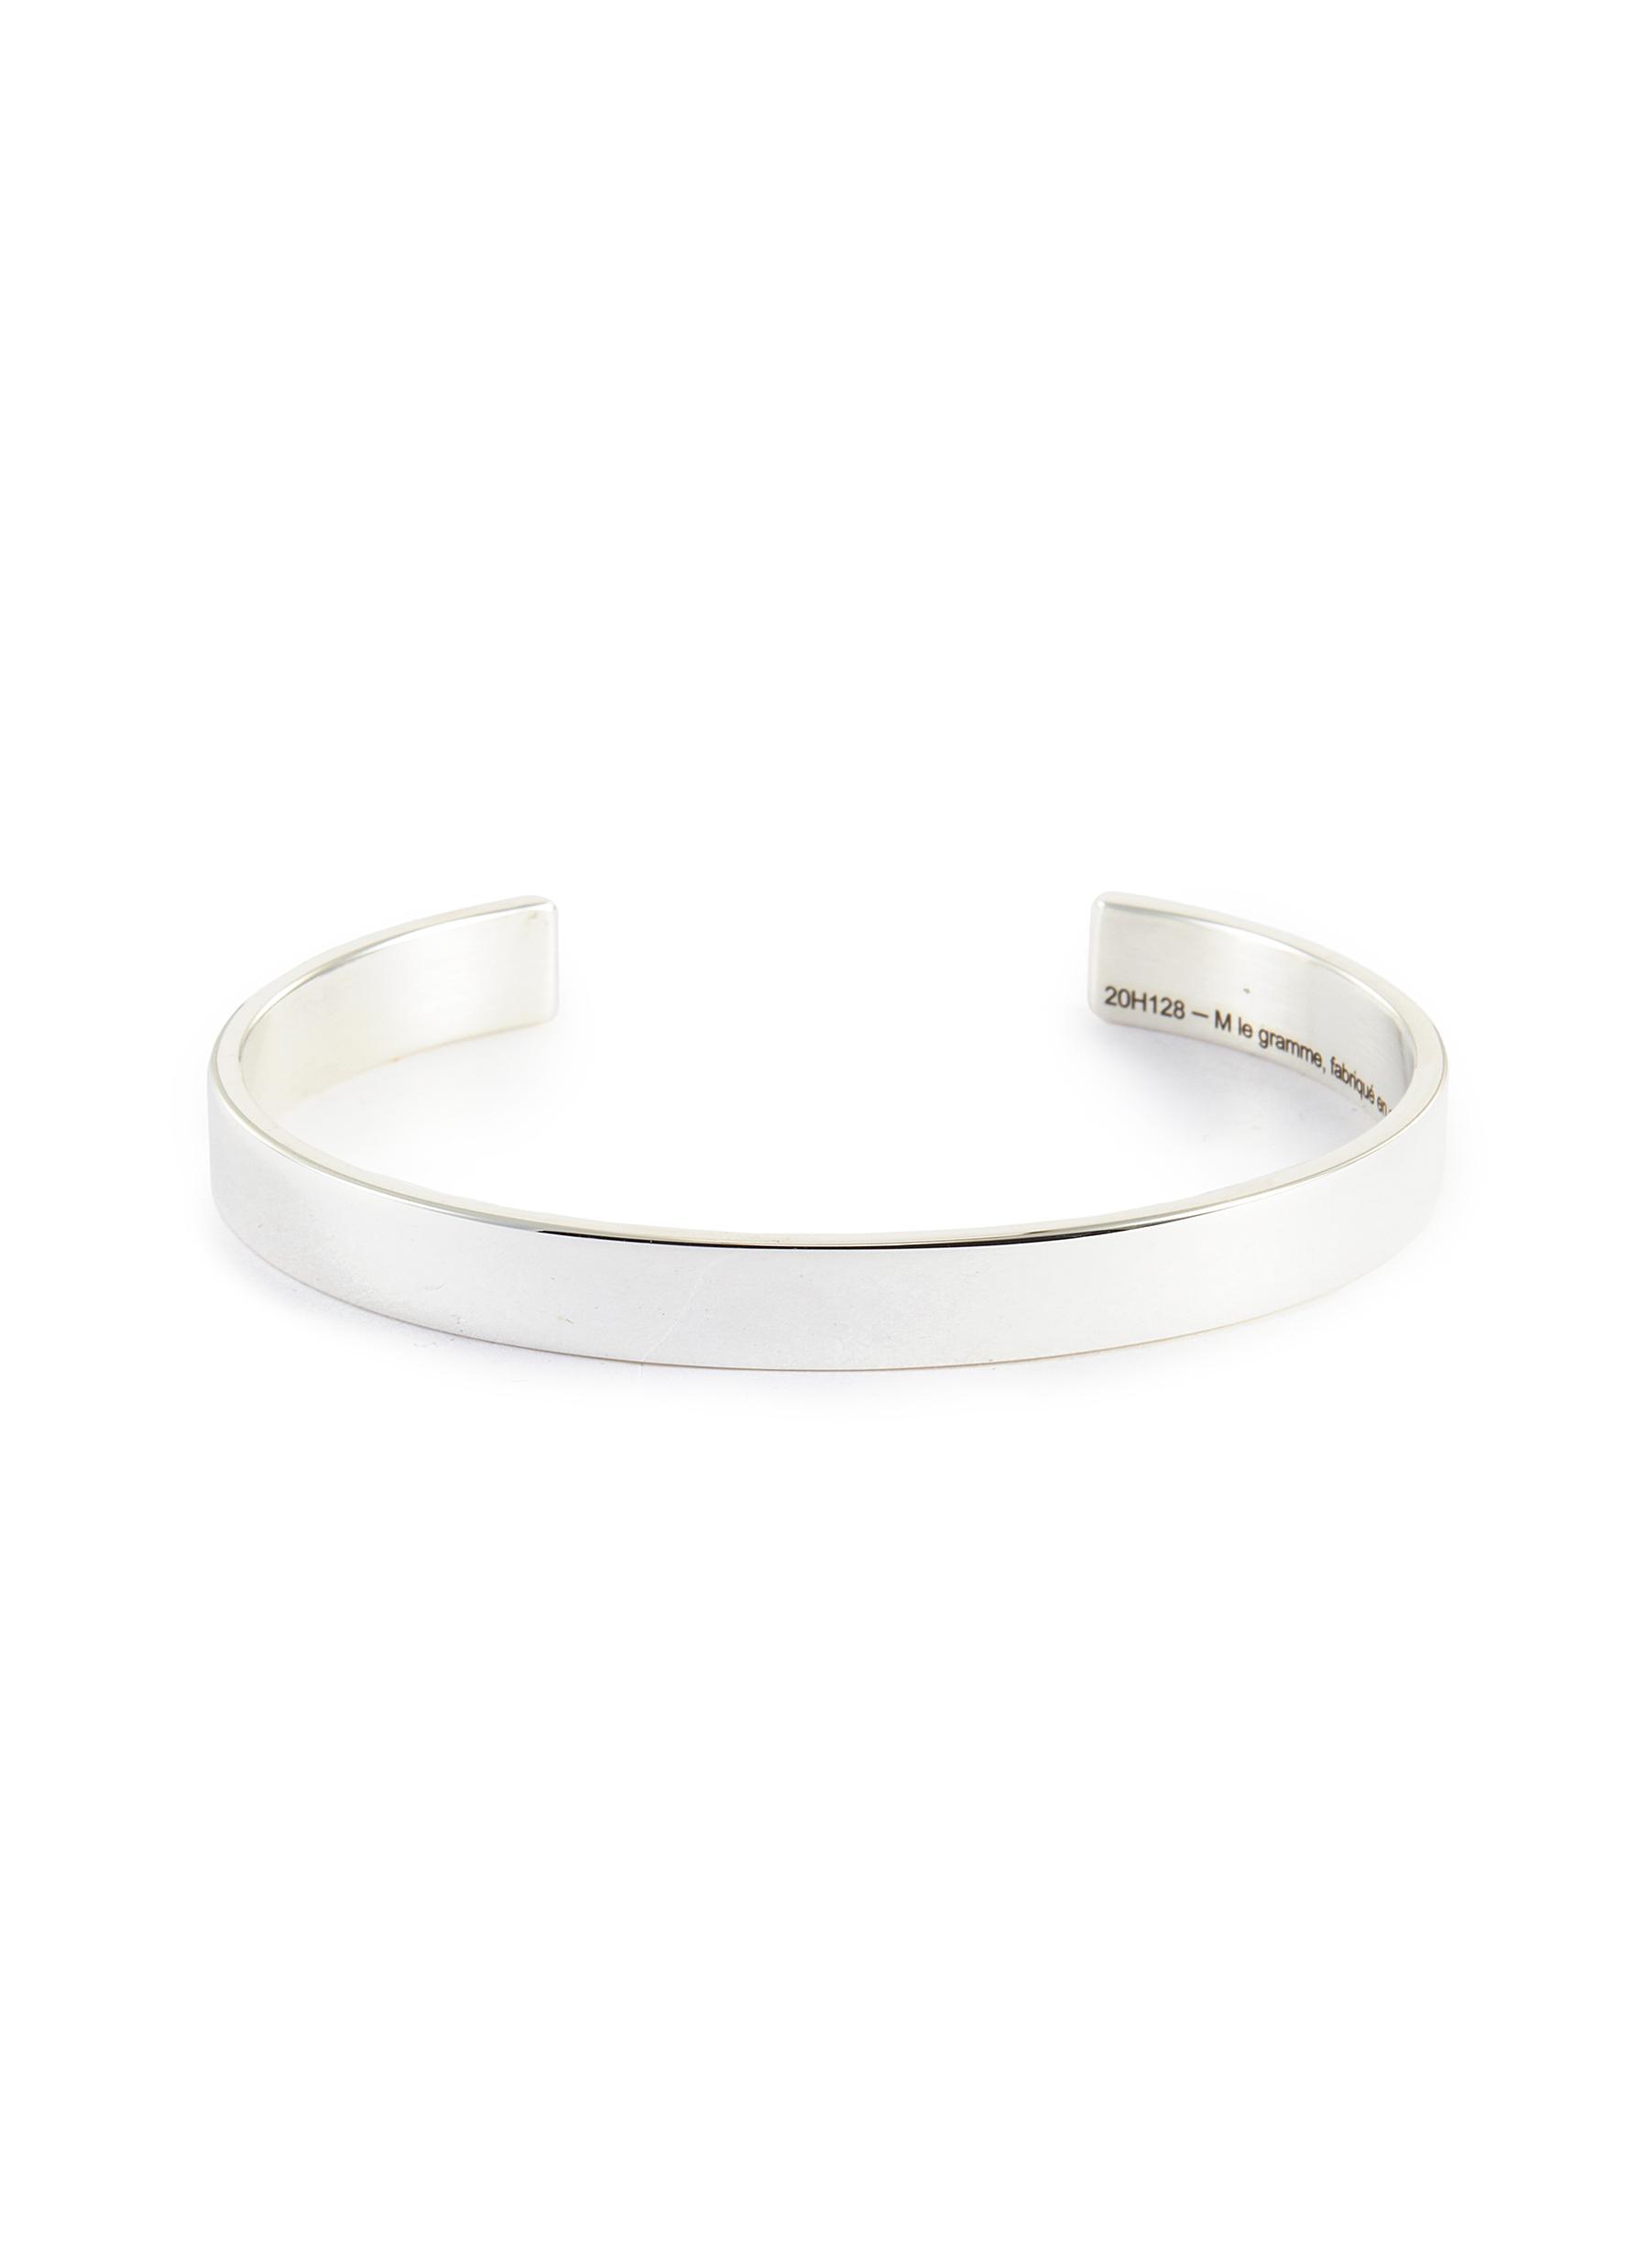 Ribbon' Silver Bangle 21g - LE GRAMME - Modalova